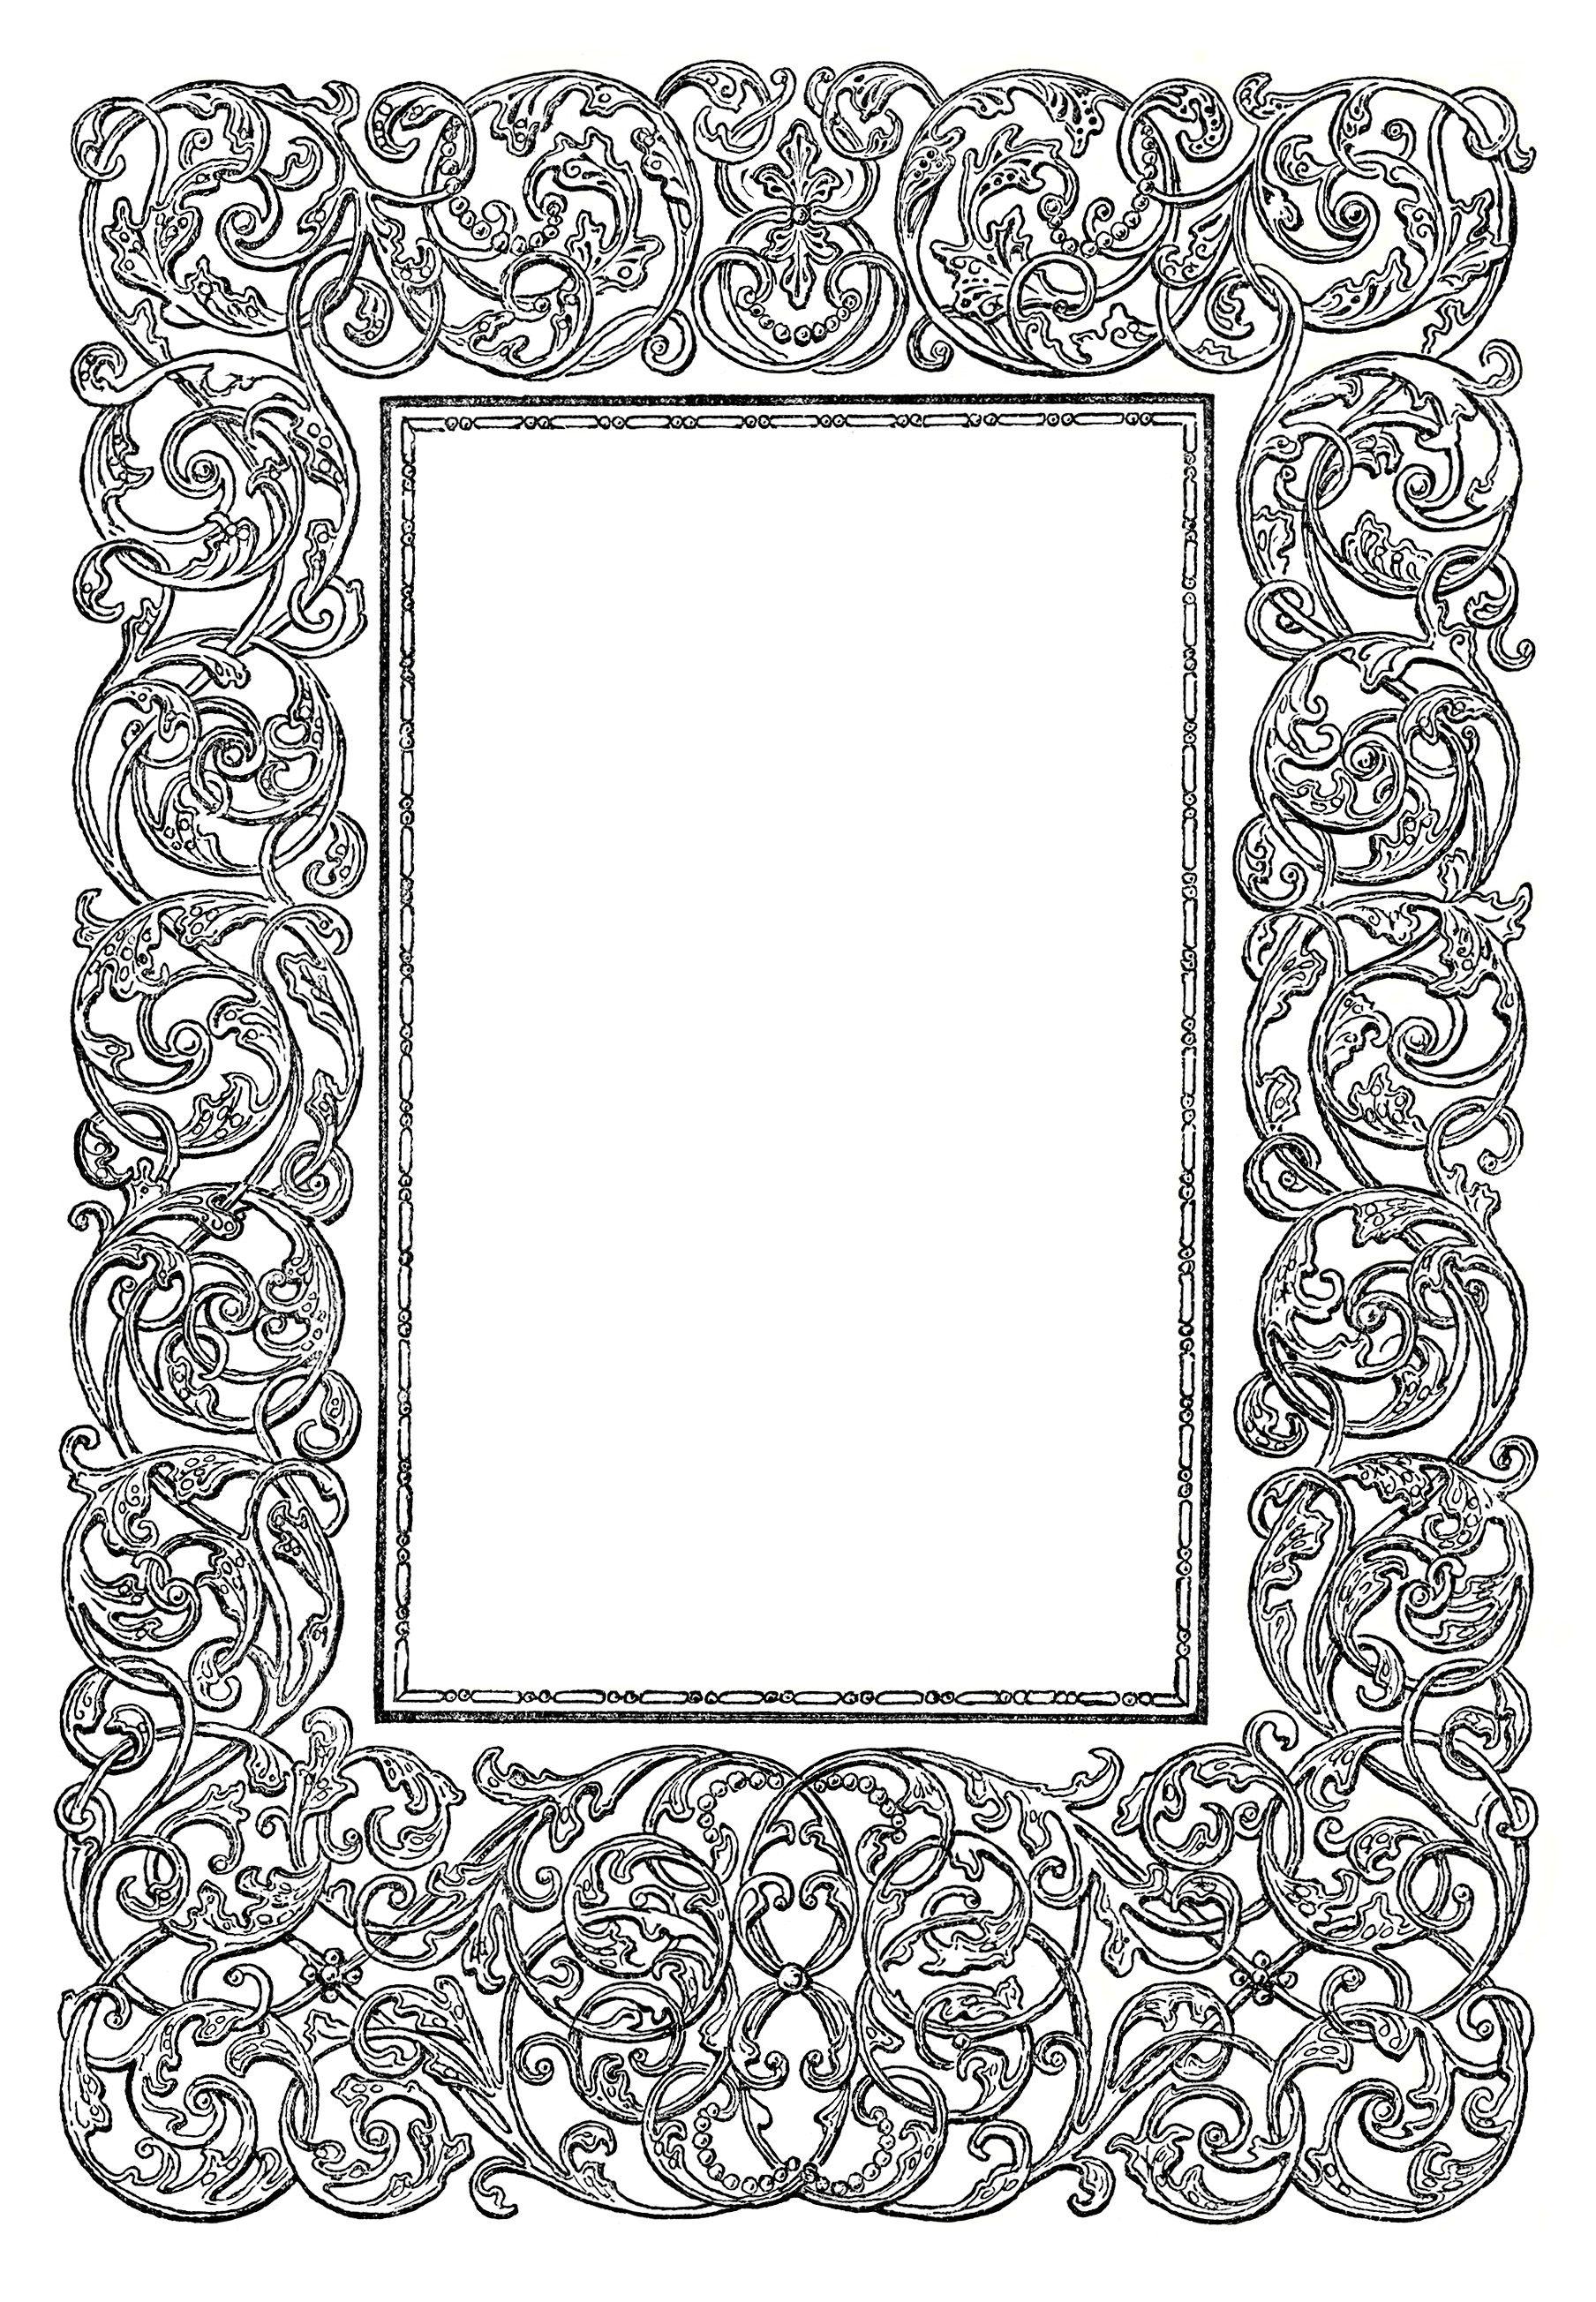 Free Vintage Image ~ Ornate Swirly Frame Clip Art.